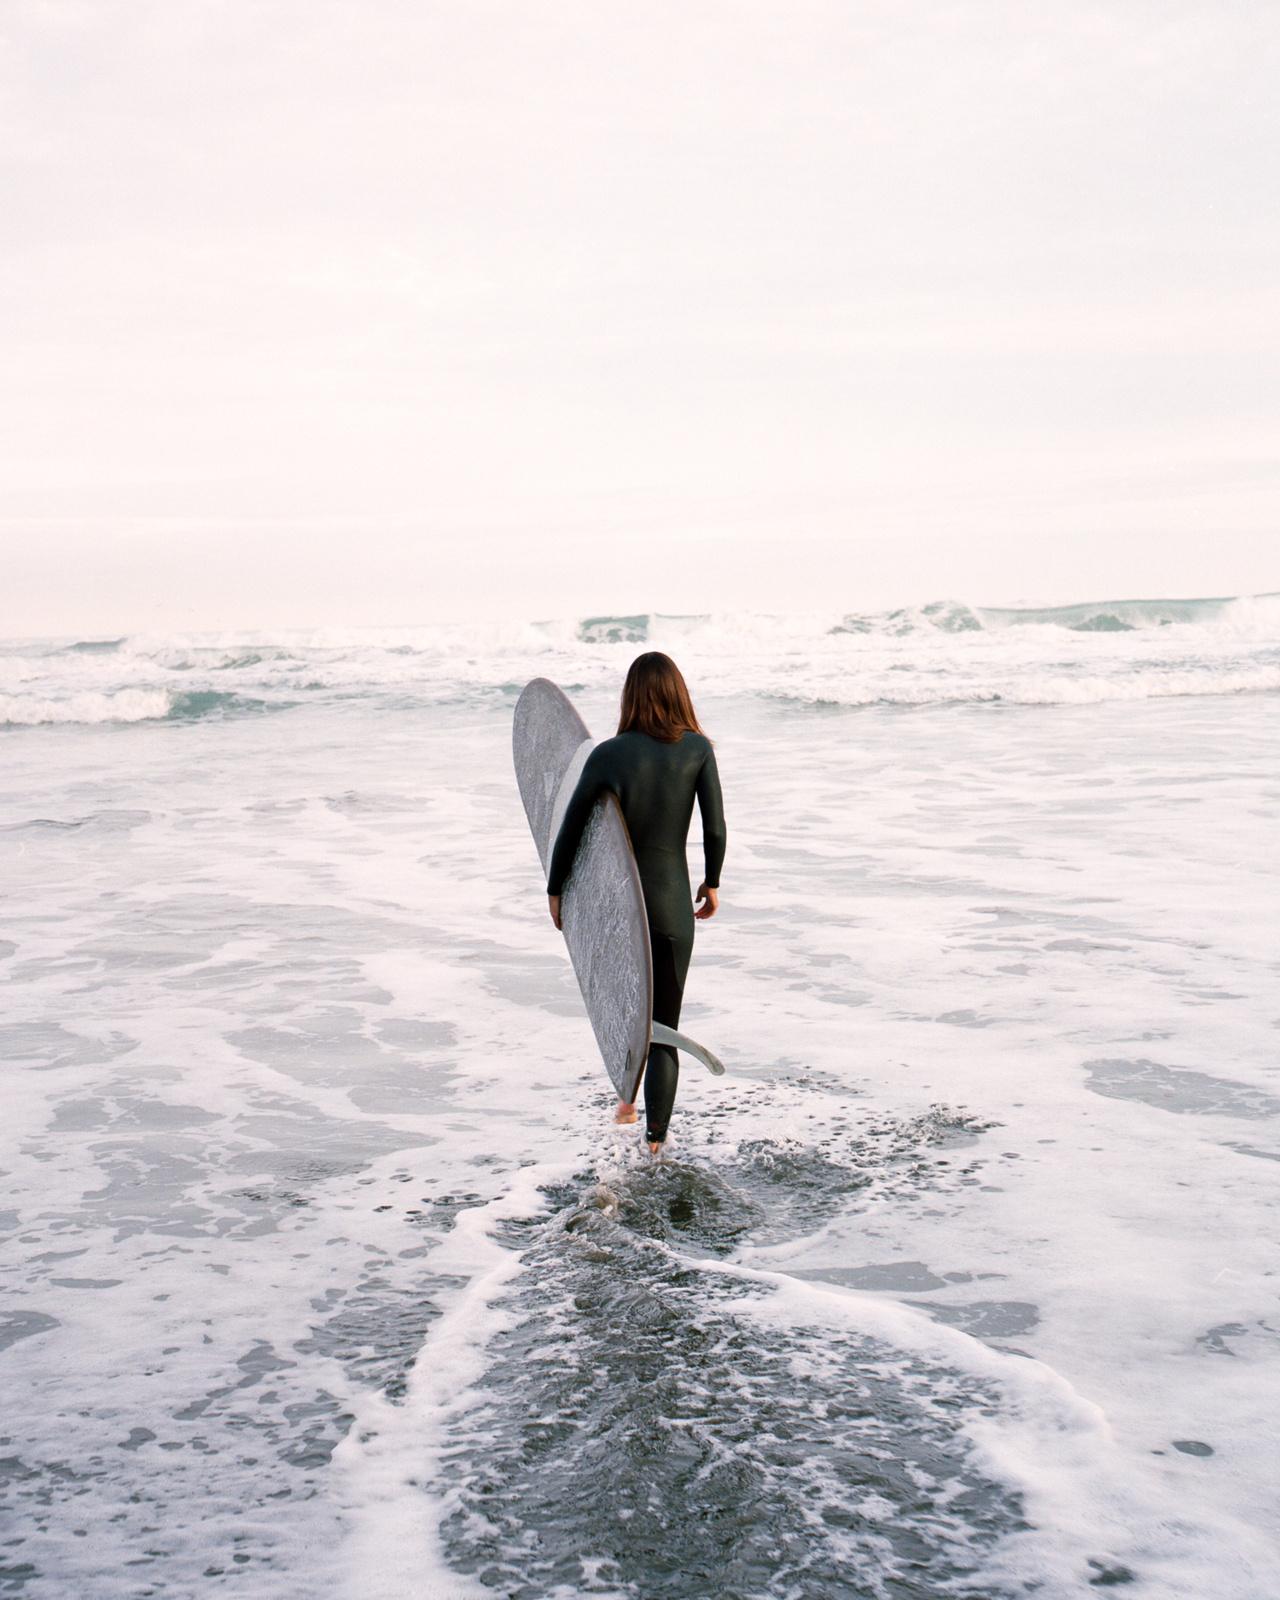 Ocean Beach, San Francisco Photo: Jarod Luebbert